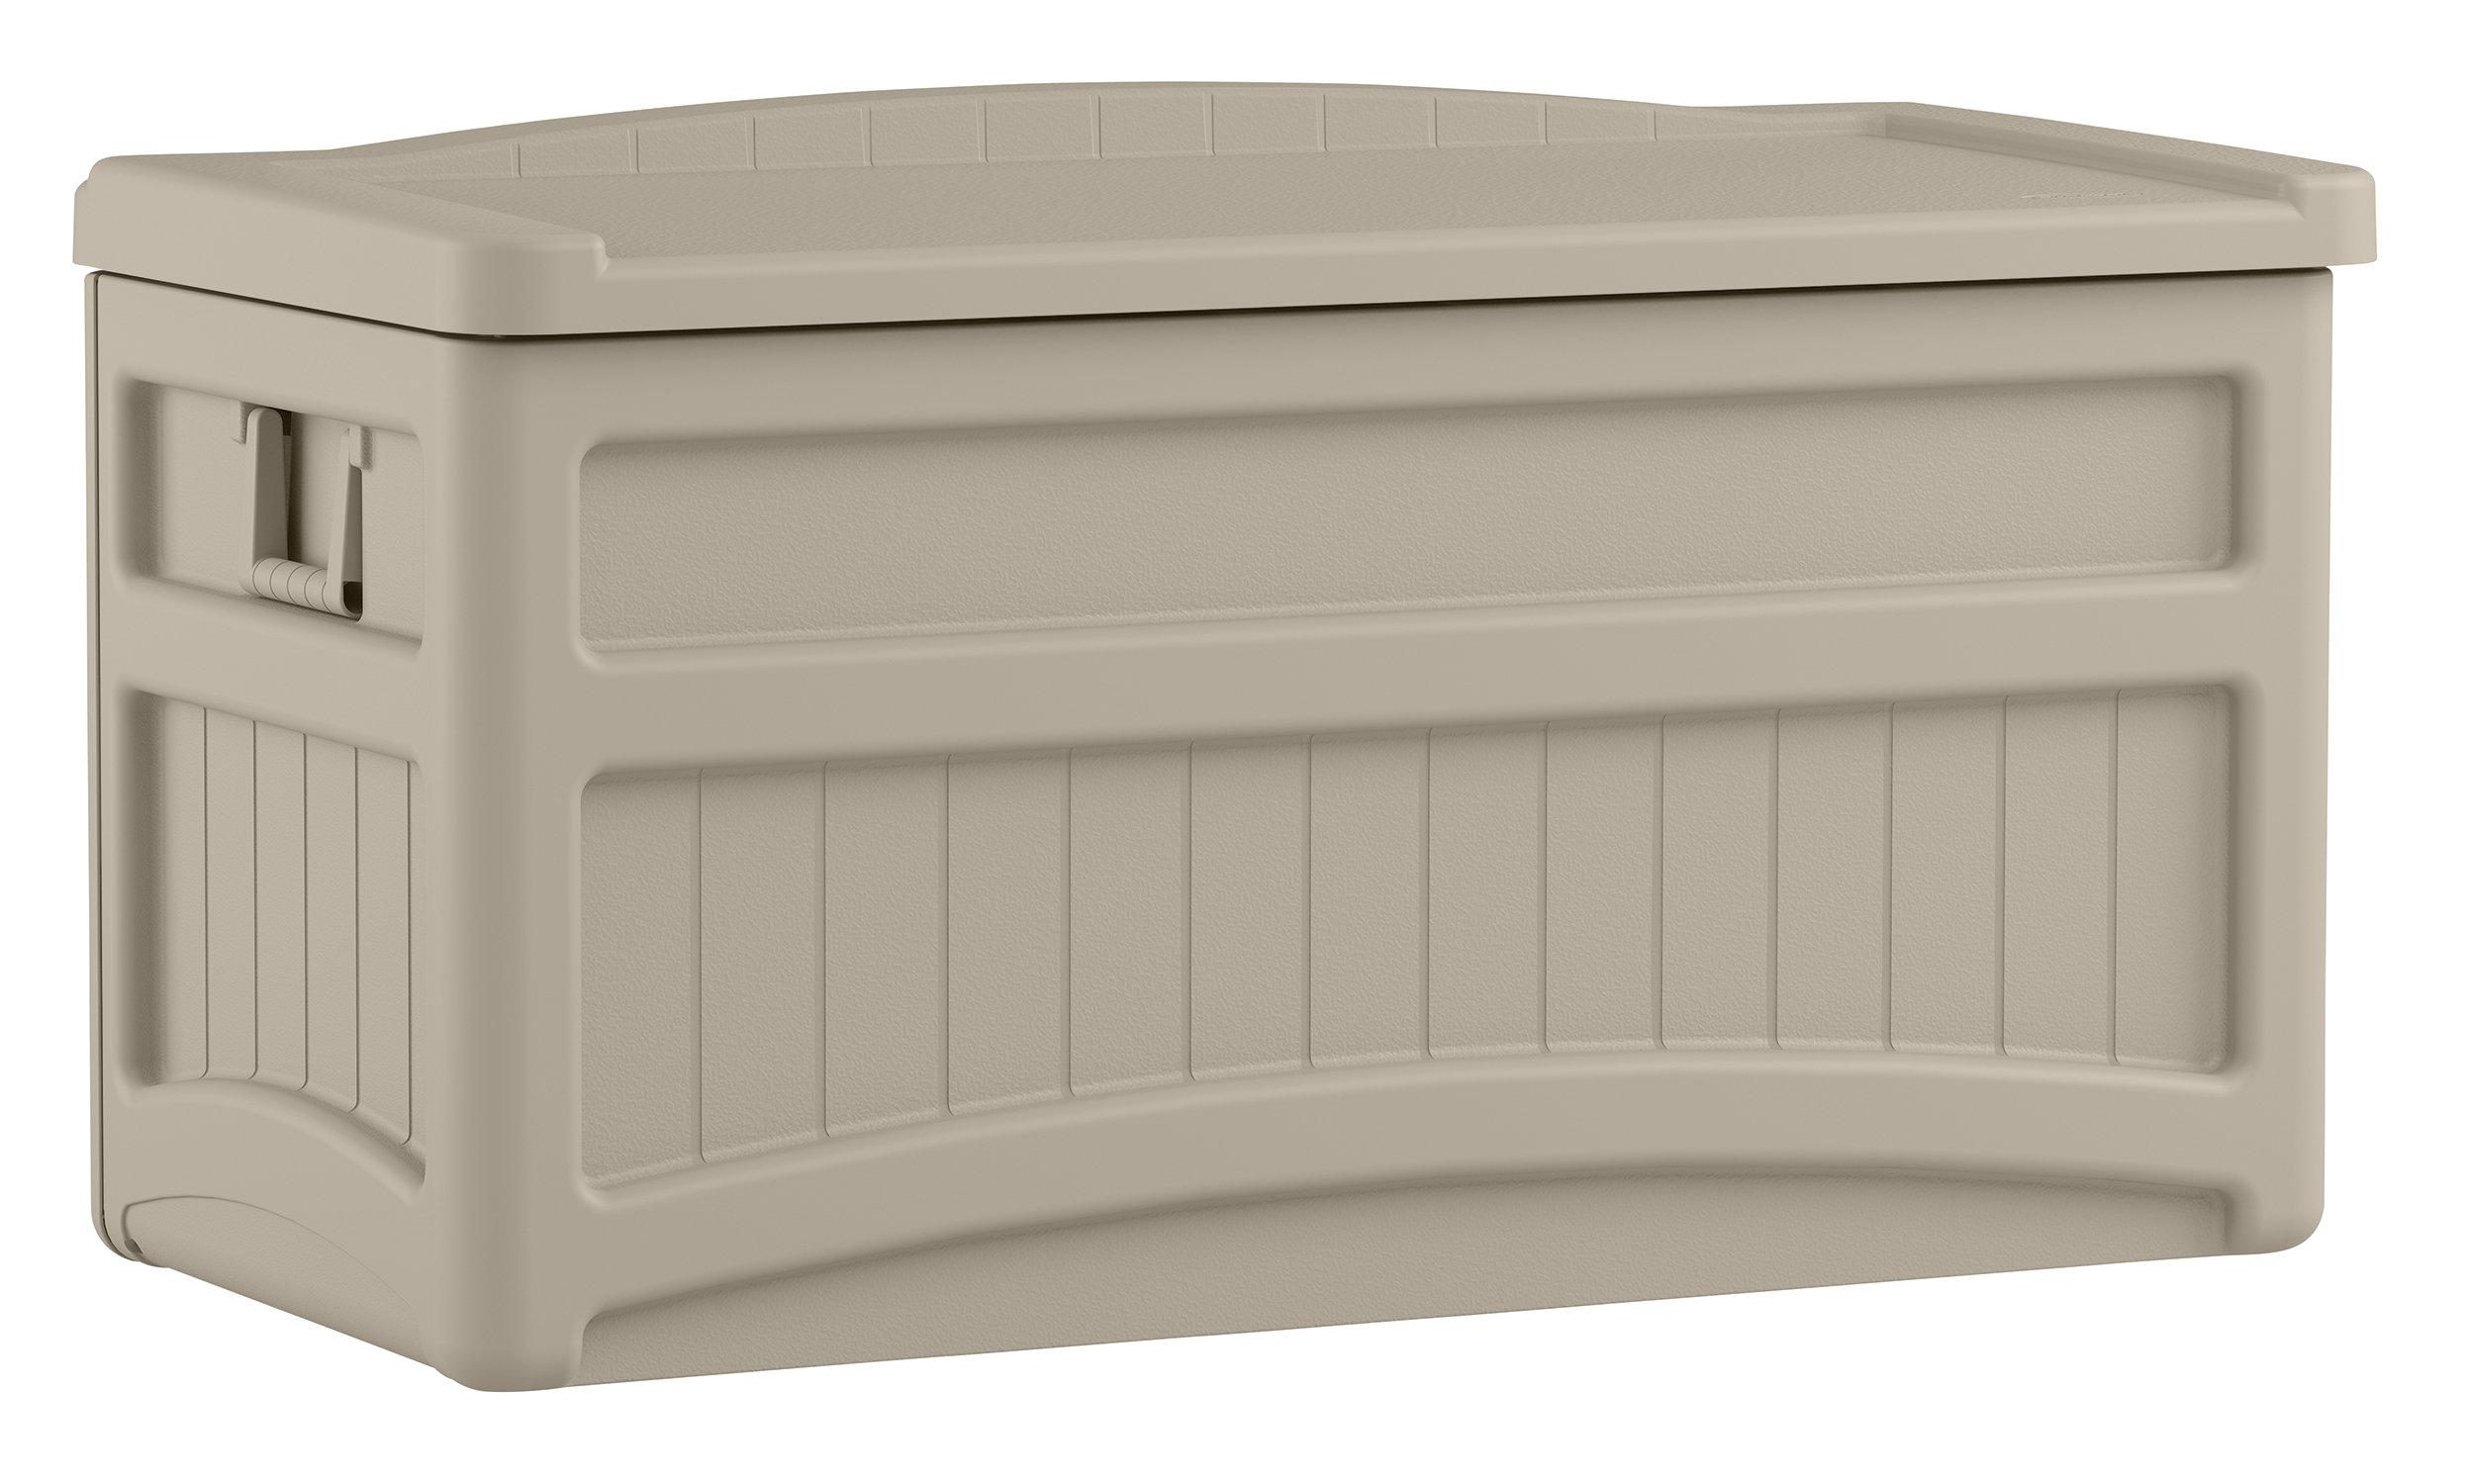 Suncast DB7500 Capacity Taupe Deck Storage Box, 73 gallon